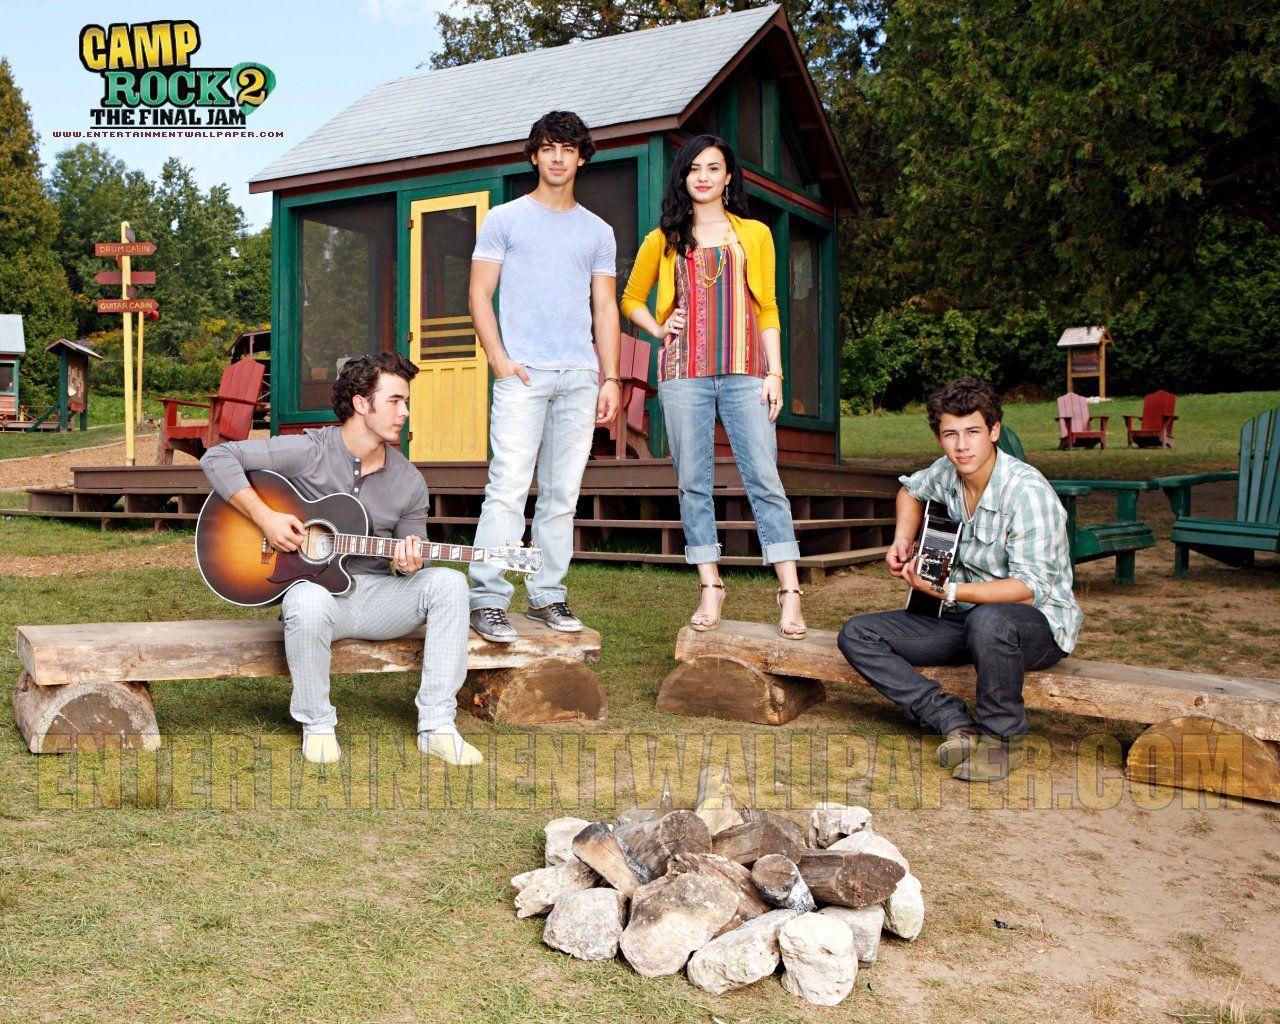 Camprock 2 The Final Jam 2010 Camp Rock Disney Memories Disney Channel Movies